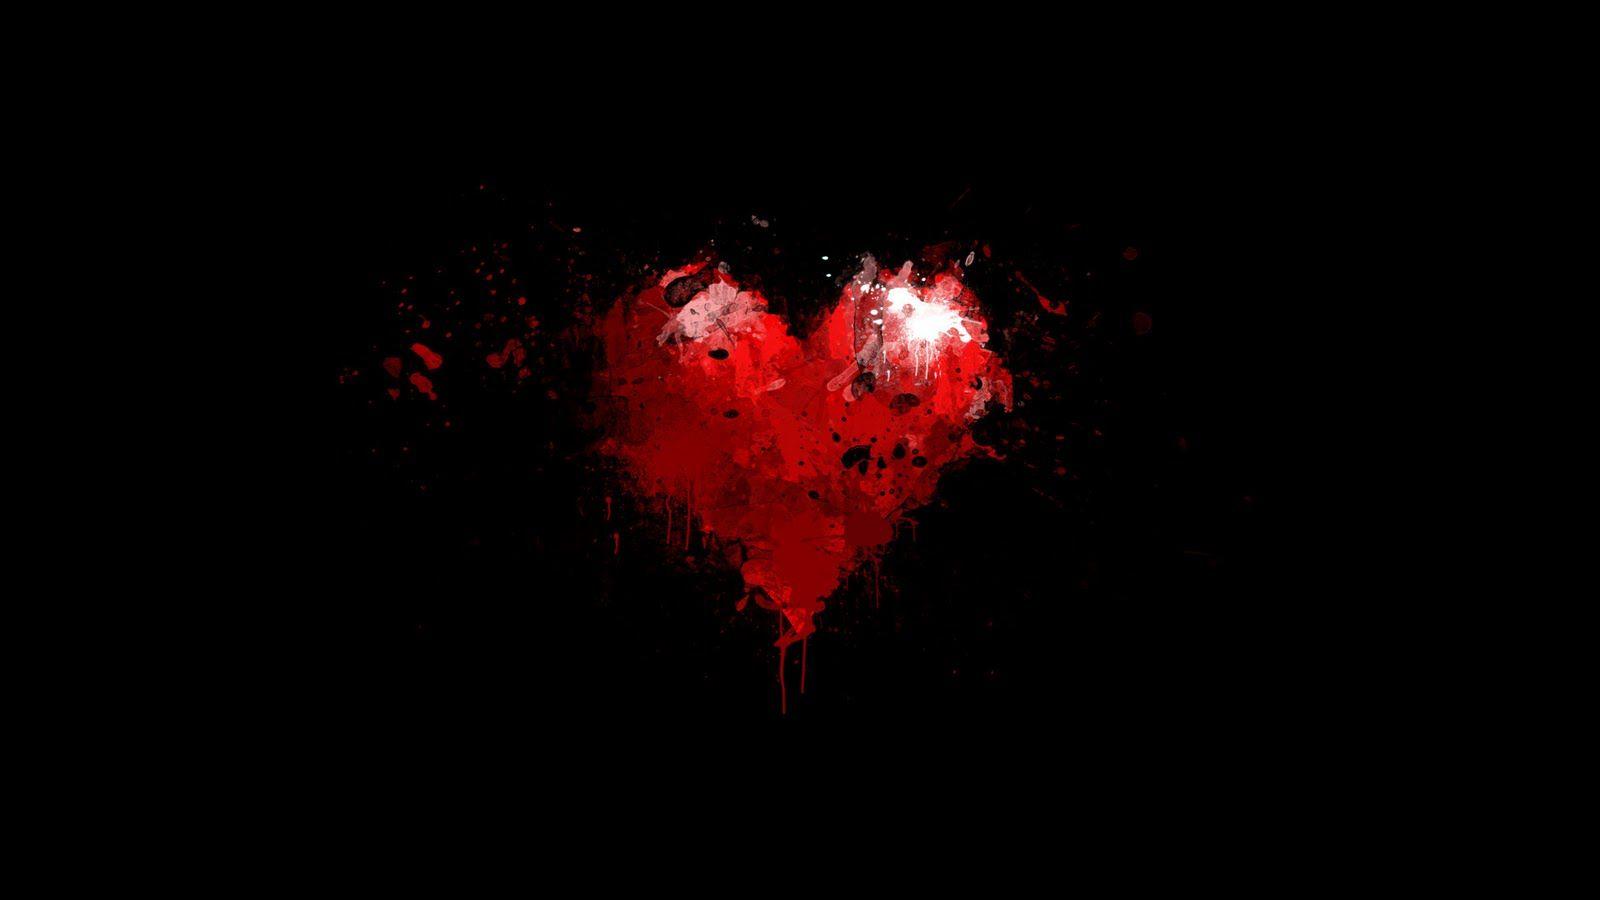 Minimalism Black Red Heart Paint Drop Hd Heart Wallpaper Broken Heart Wallpaper Black Background Wallpaper